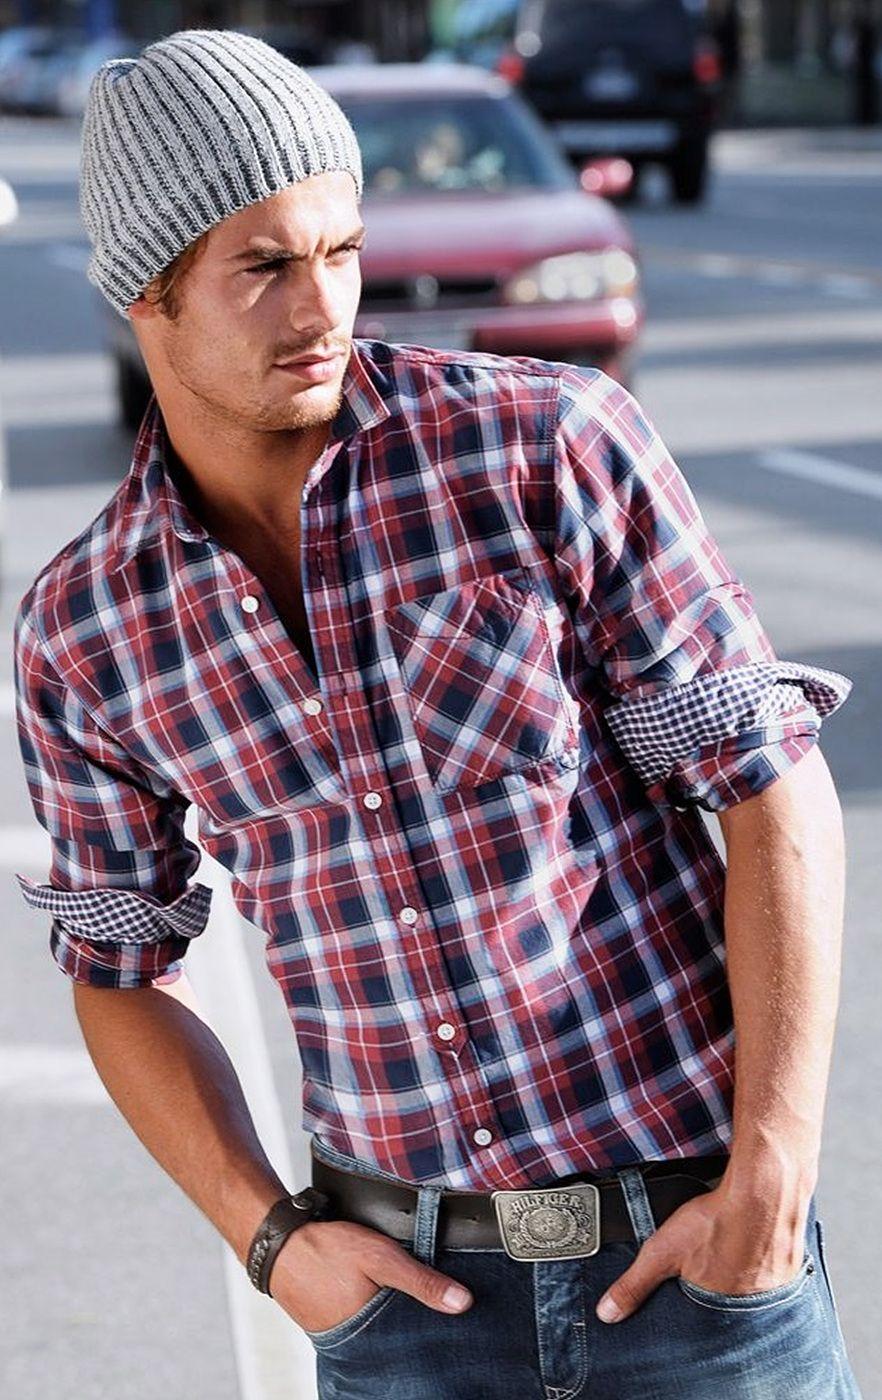 cute karo hemd shirts for real men in 2019. Black Bedroom Furniture Sets. Home Design Ideas